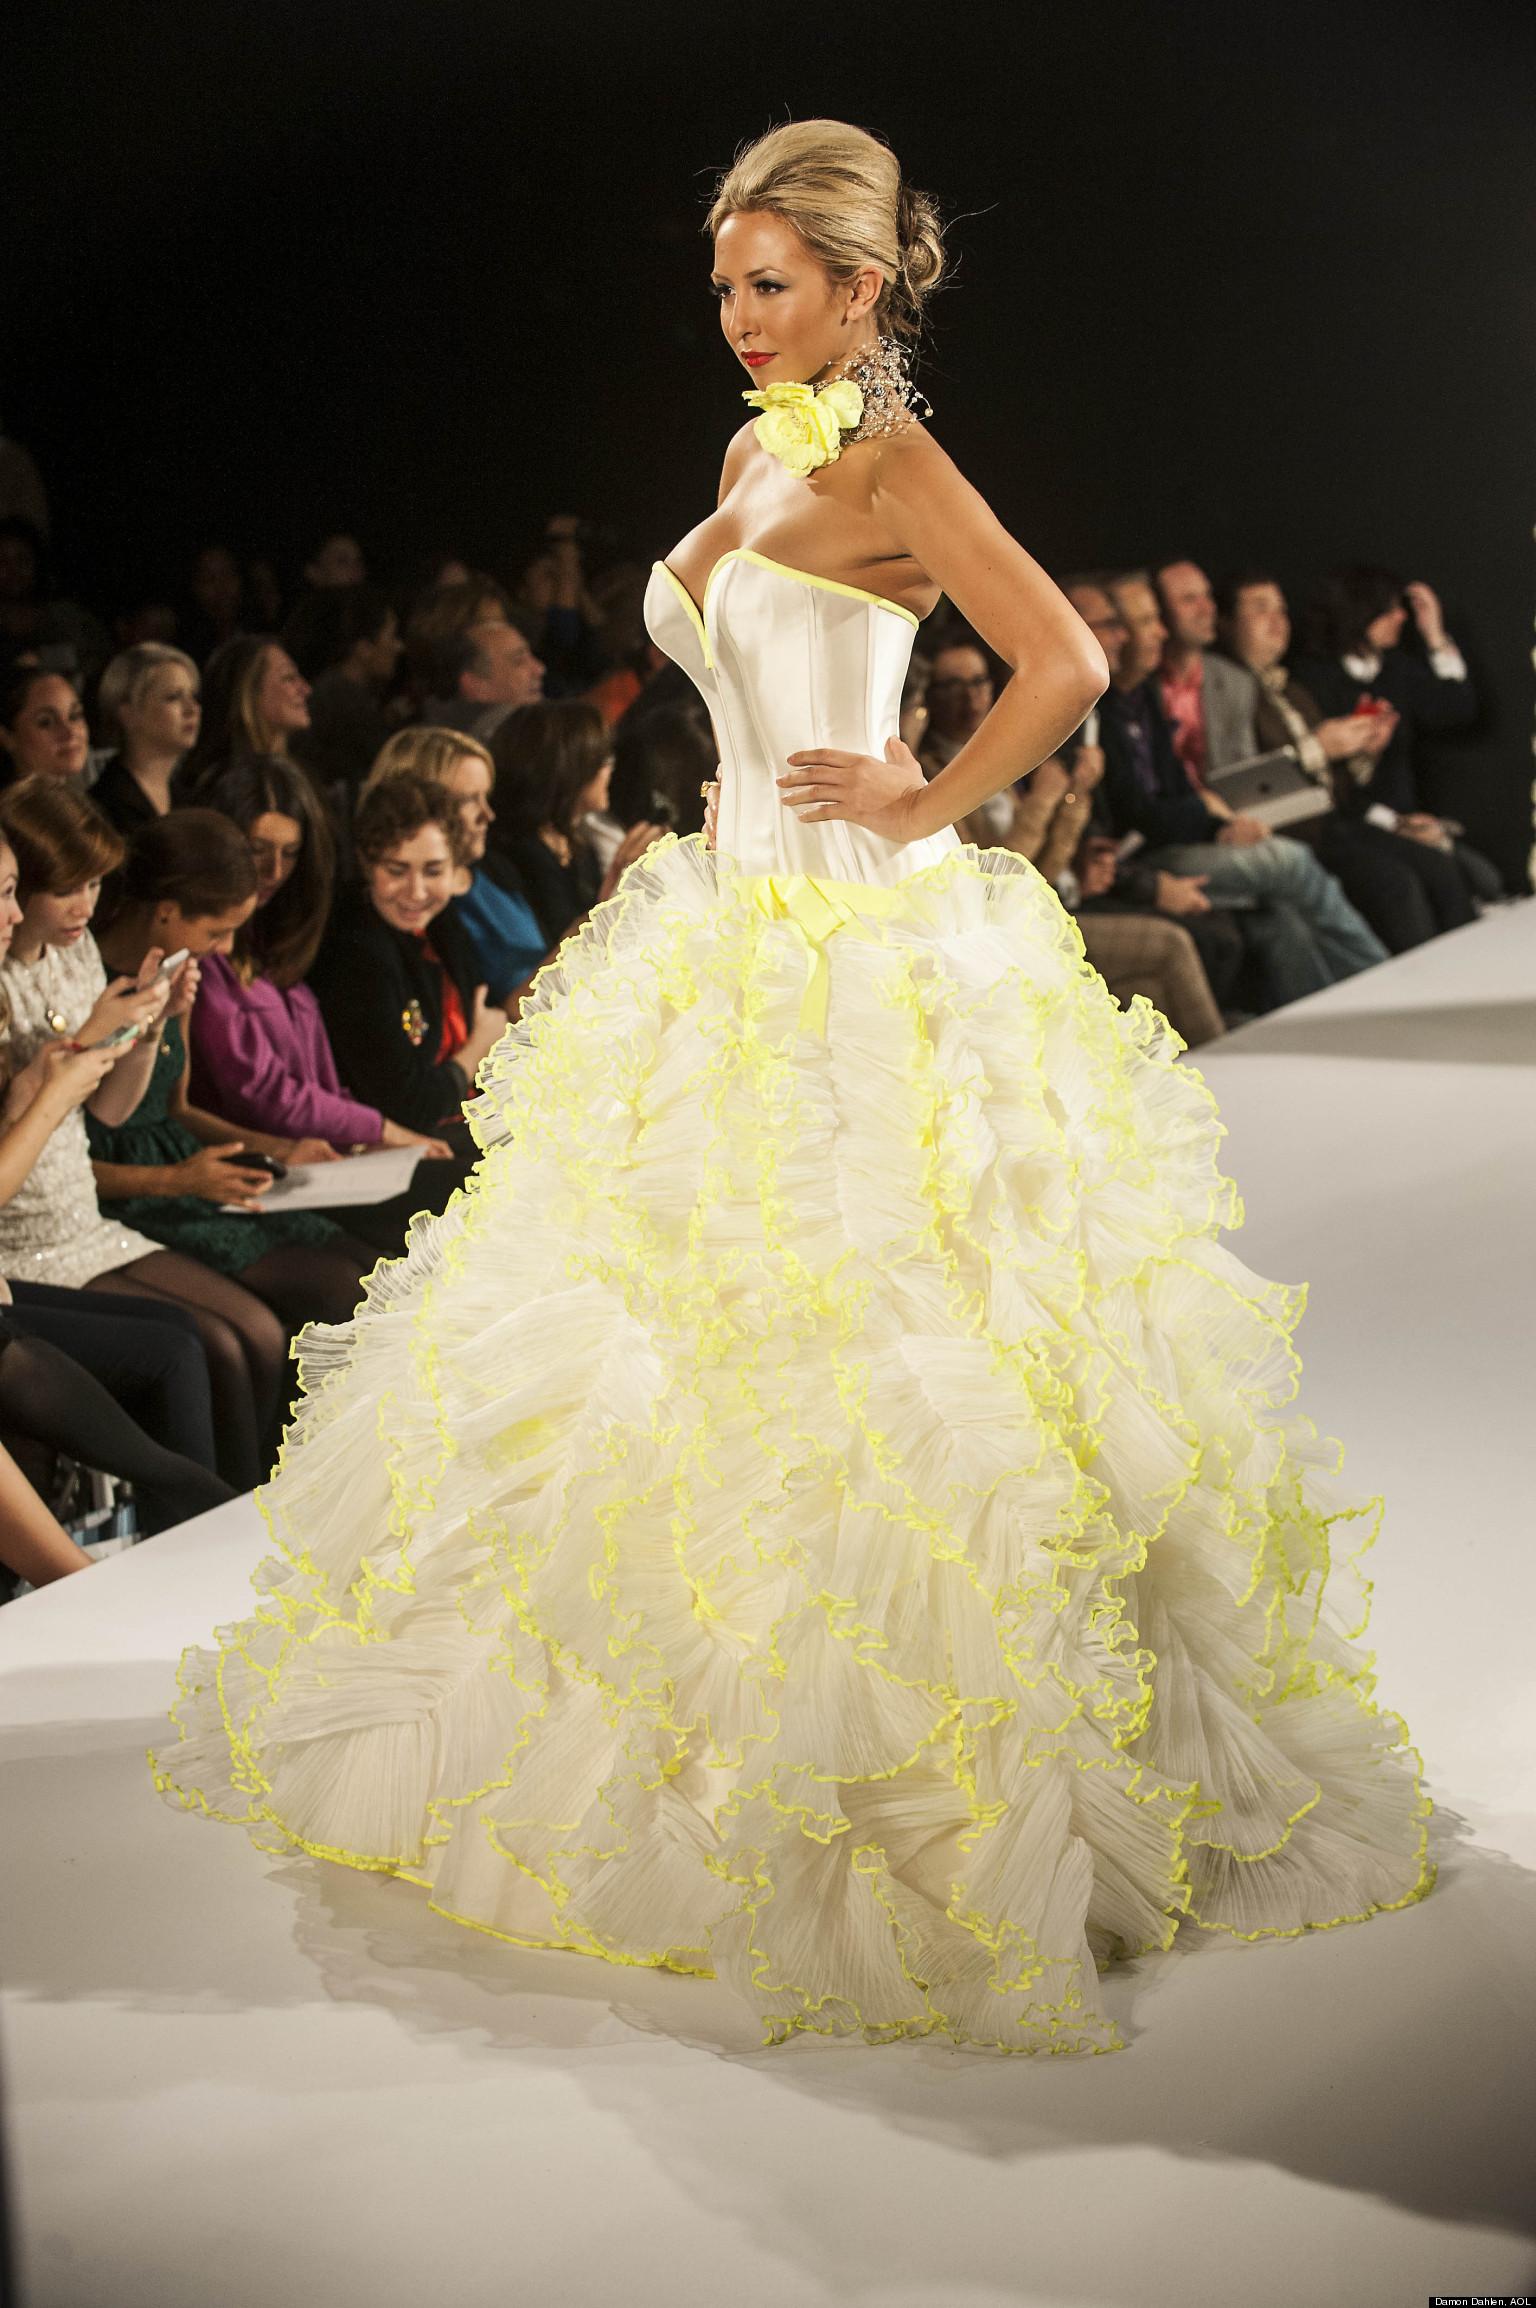 Wedding Dress Trends Most Daring 2013 Styles VIDEO